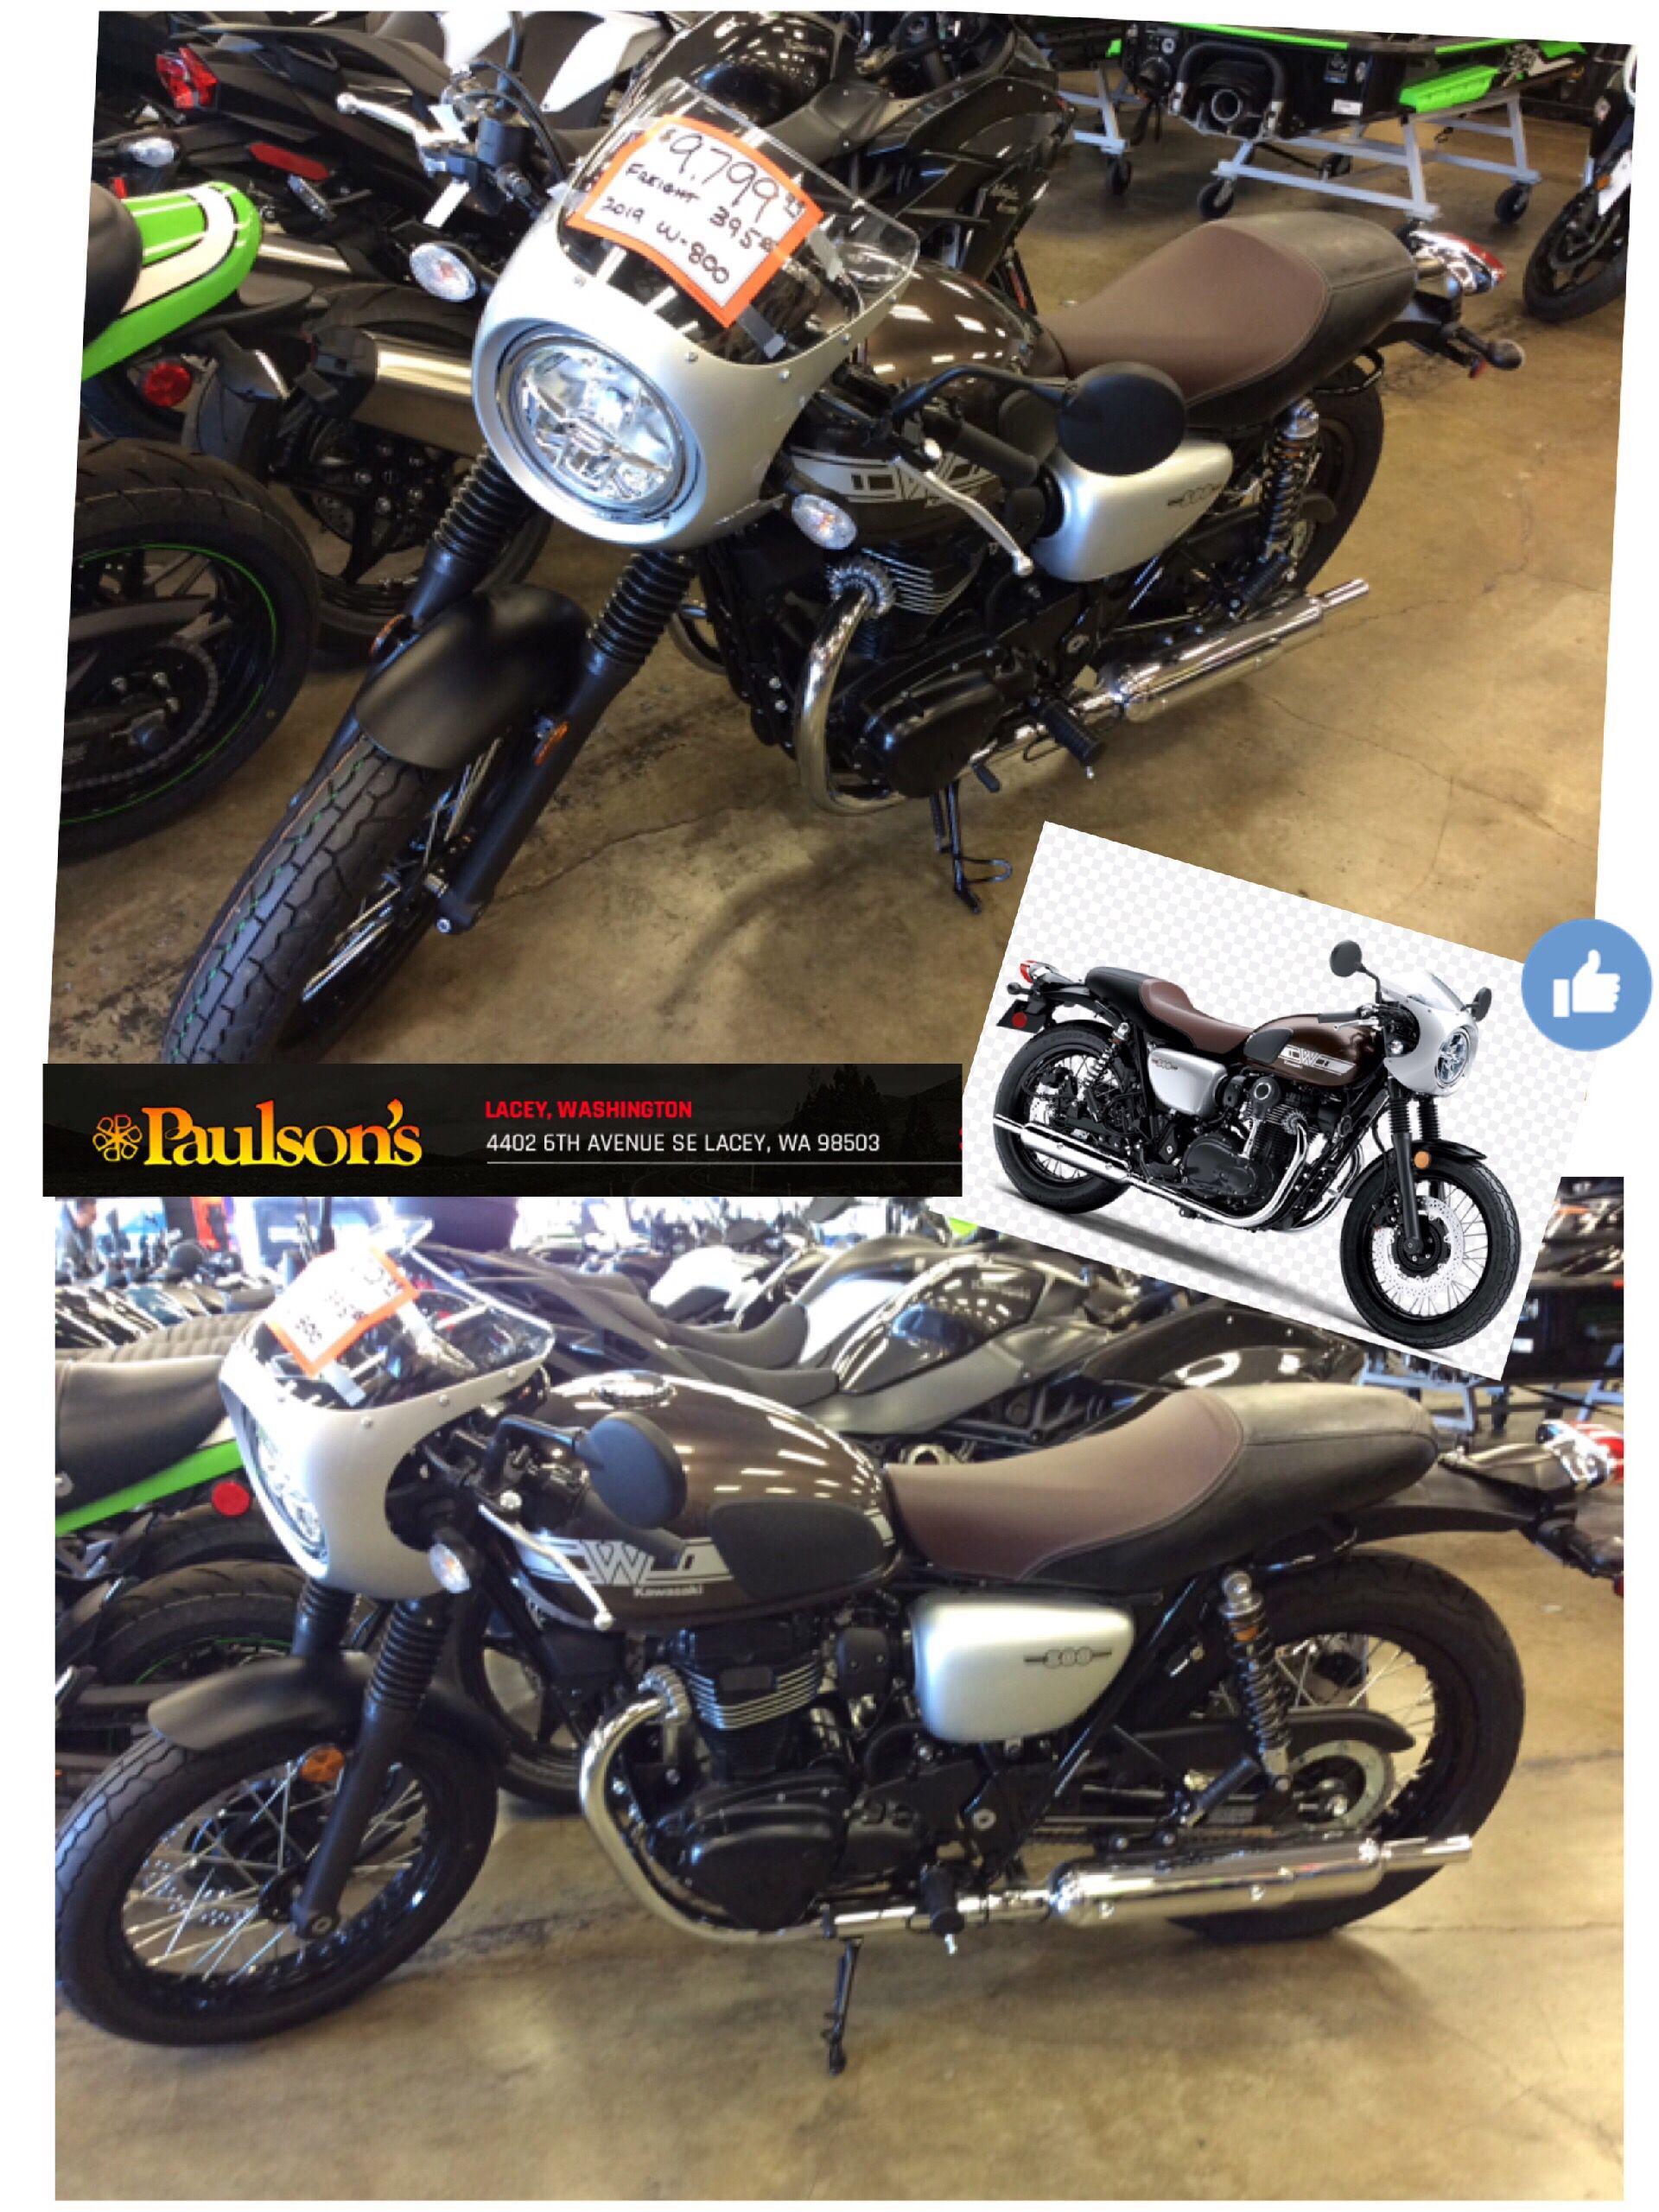 2019 Kawasaki W800 Motorsport, Vehicles, Motorcycle